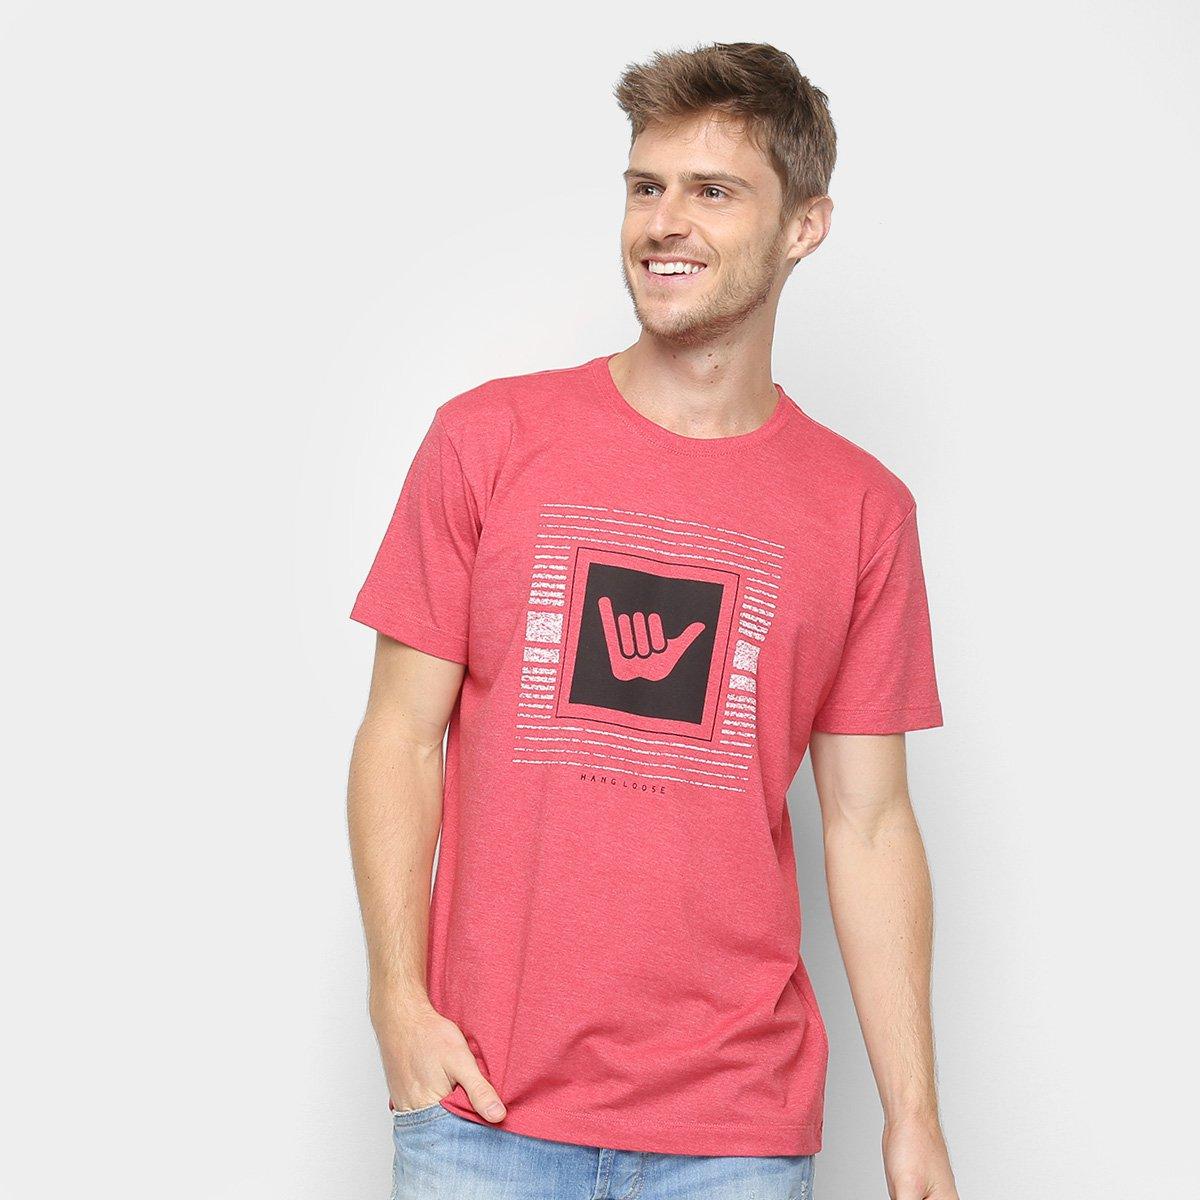 Camiseta Hang Loose Silk Logotop Masculina - Vermelho e Cinza ... 9bb4d6e57ddf6